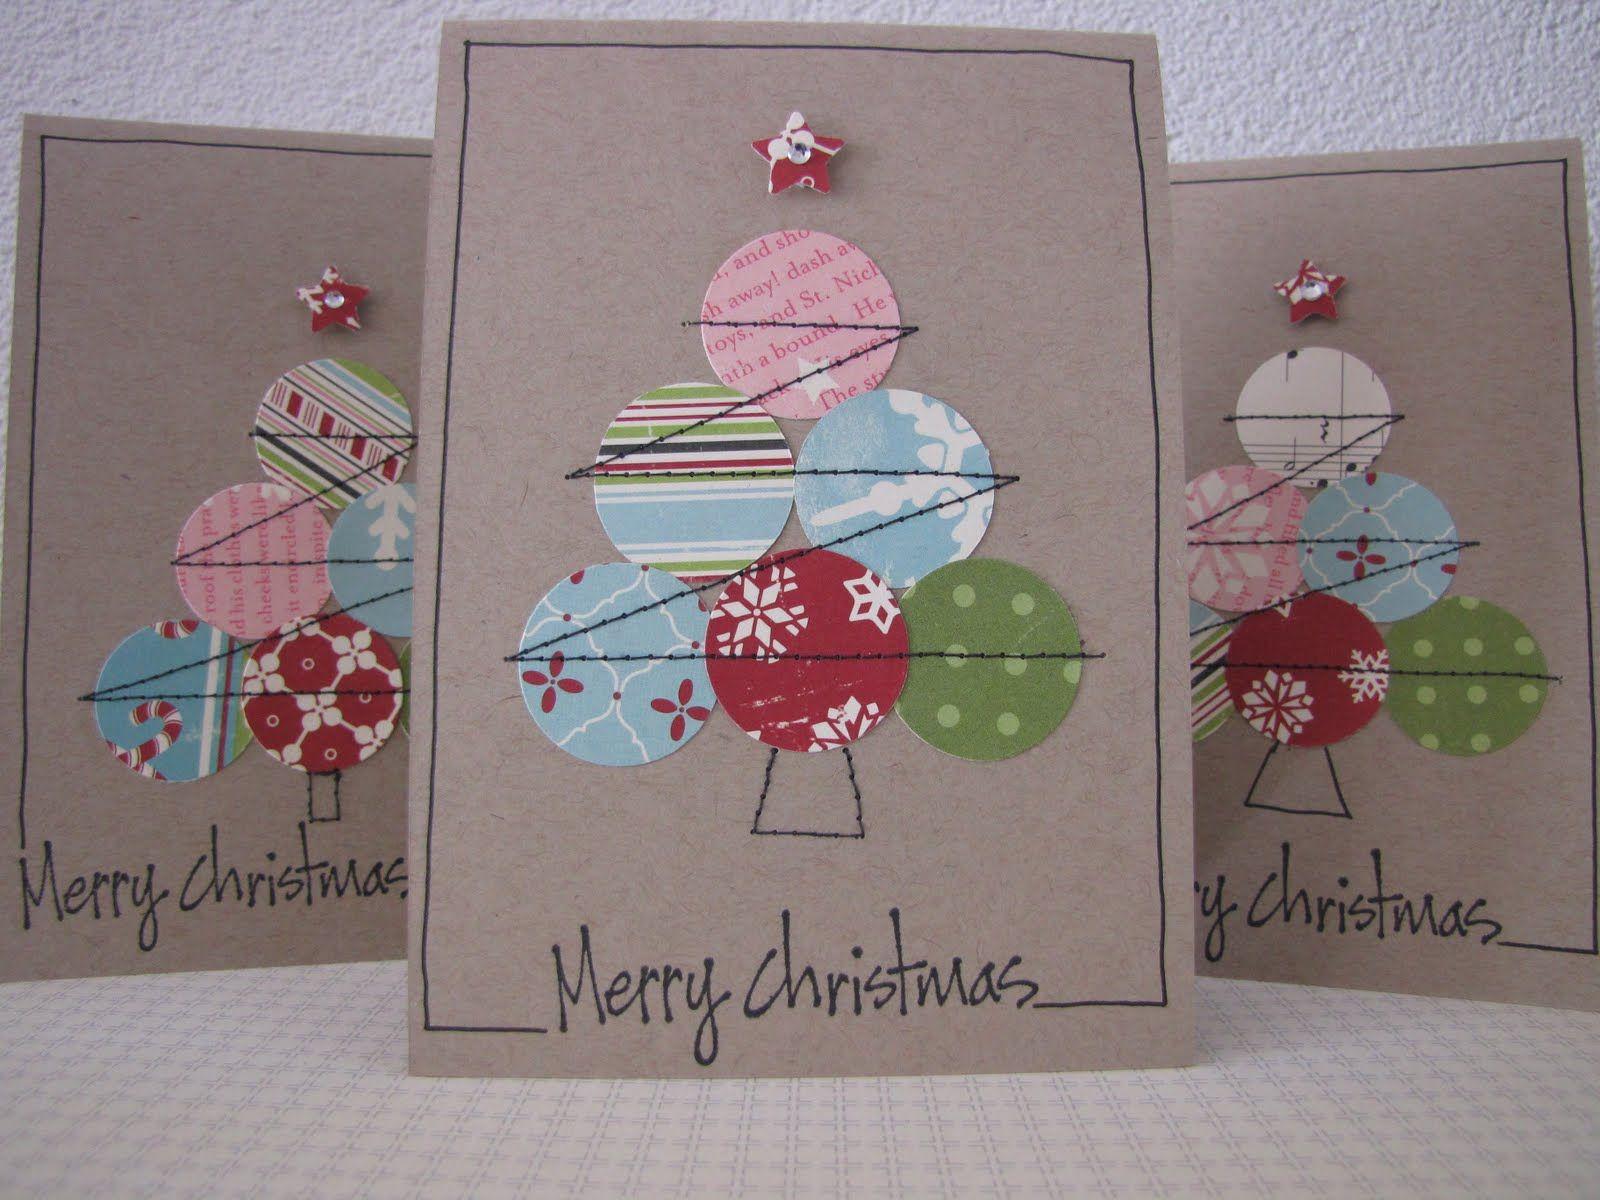 Kerstmarkt eschhoek pinterest weihnachtskarten for Weihnachtskarten pinterest